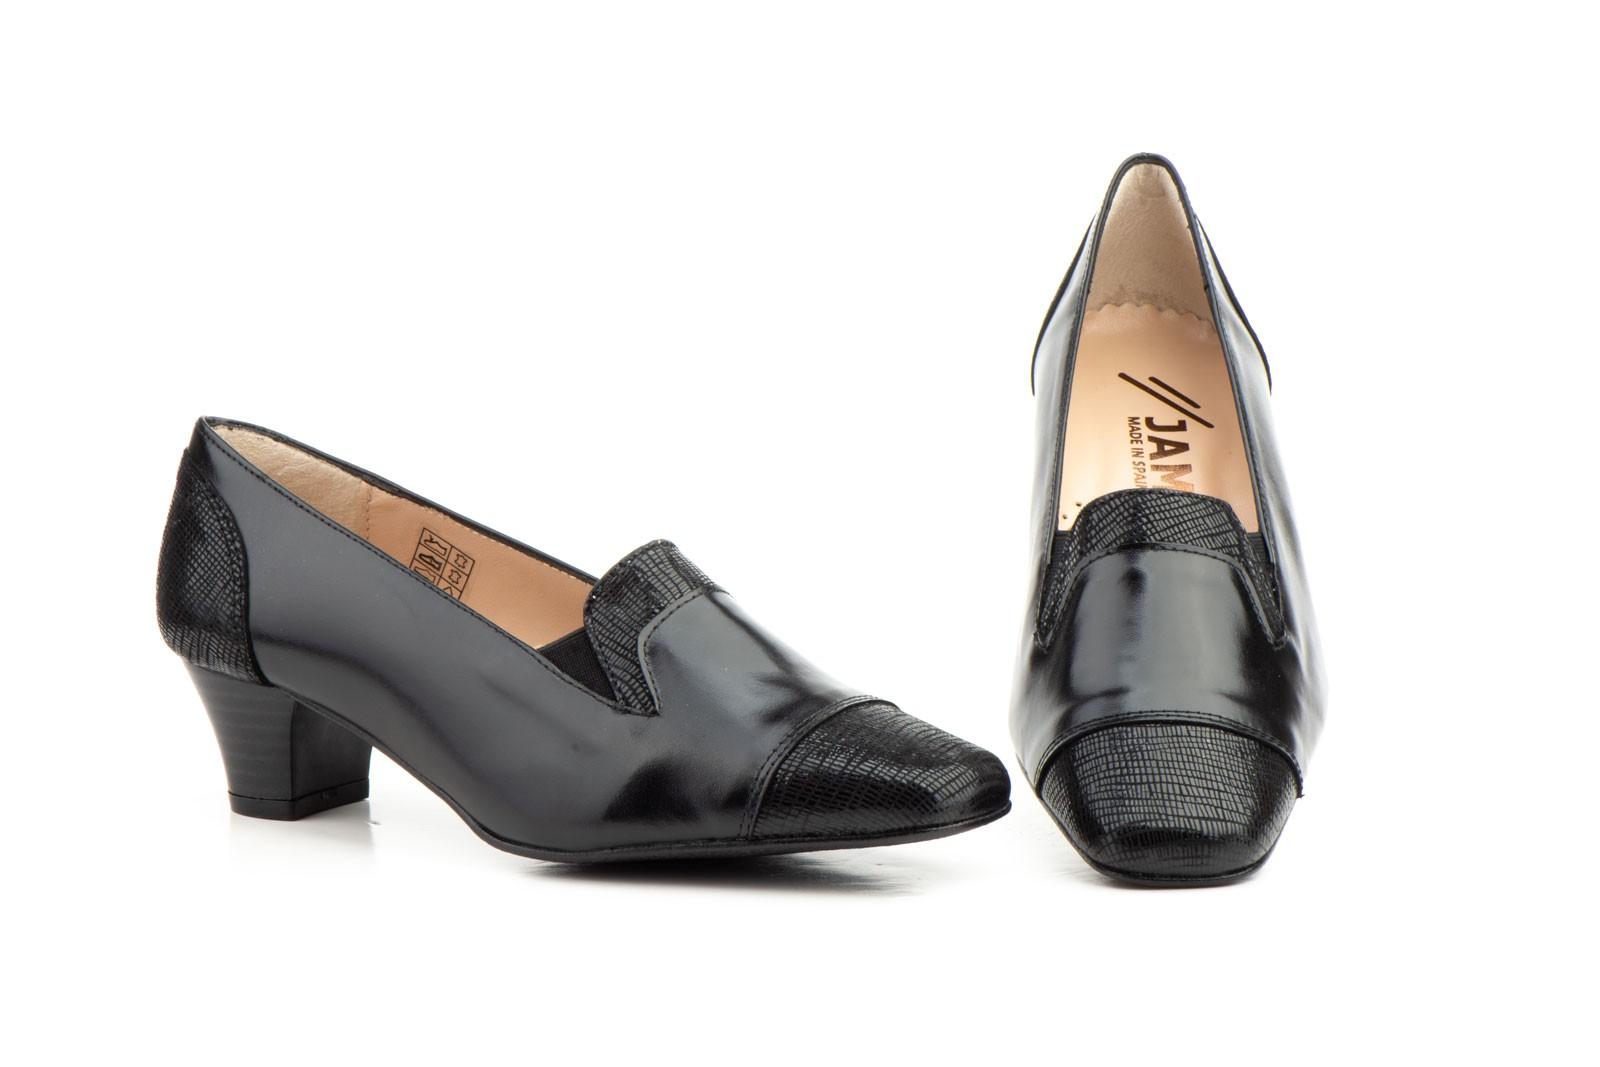 a16bb12f805 Zapatos Mujer Vestir Piel Negro Tacón JAM-5219 52